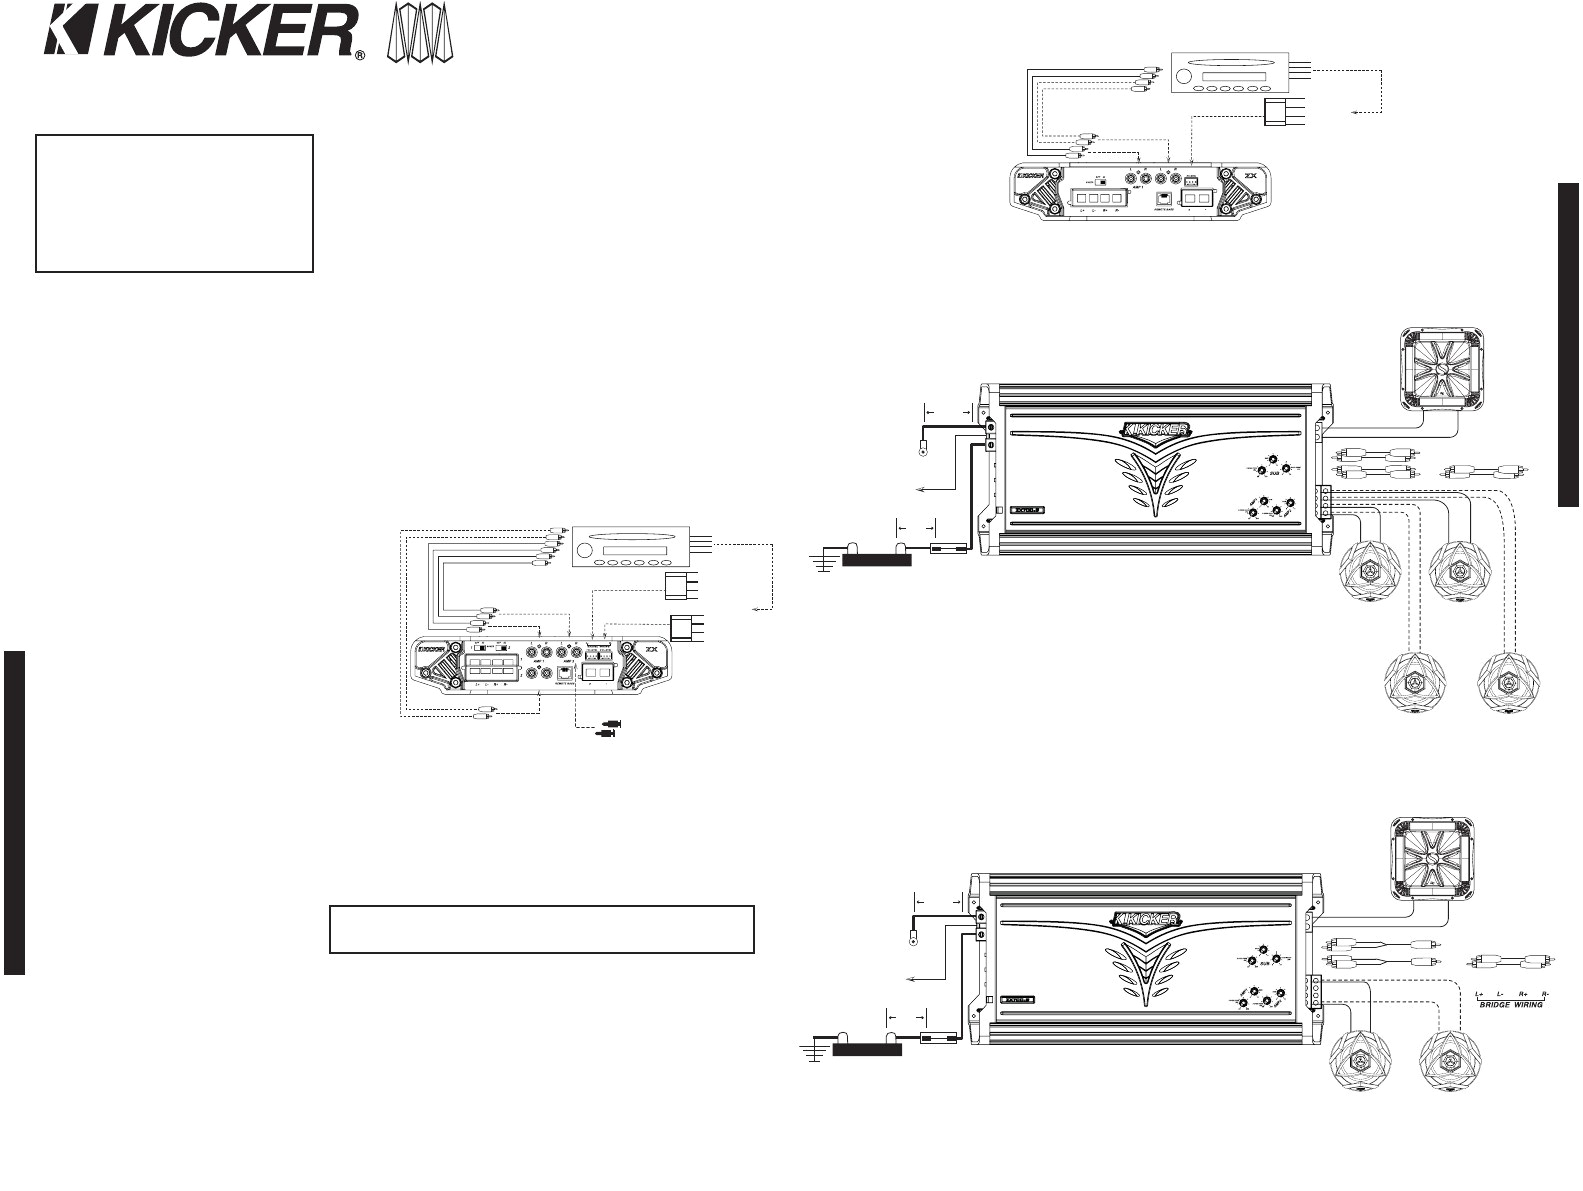 Kicker Cxa600 1 Wiring Diagram Wiring Diagram 5 Channel 13 Kicker Wiring Diagram